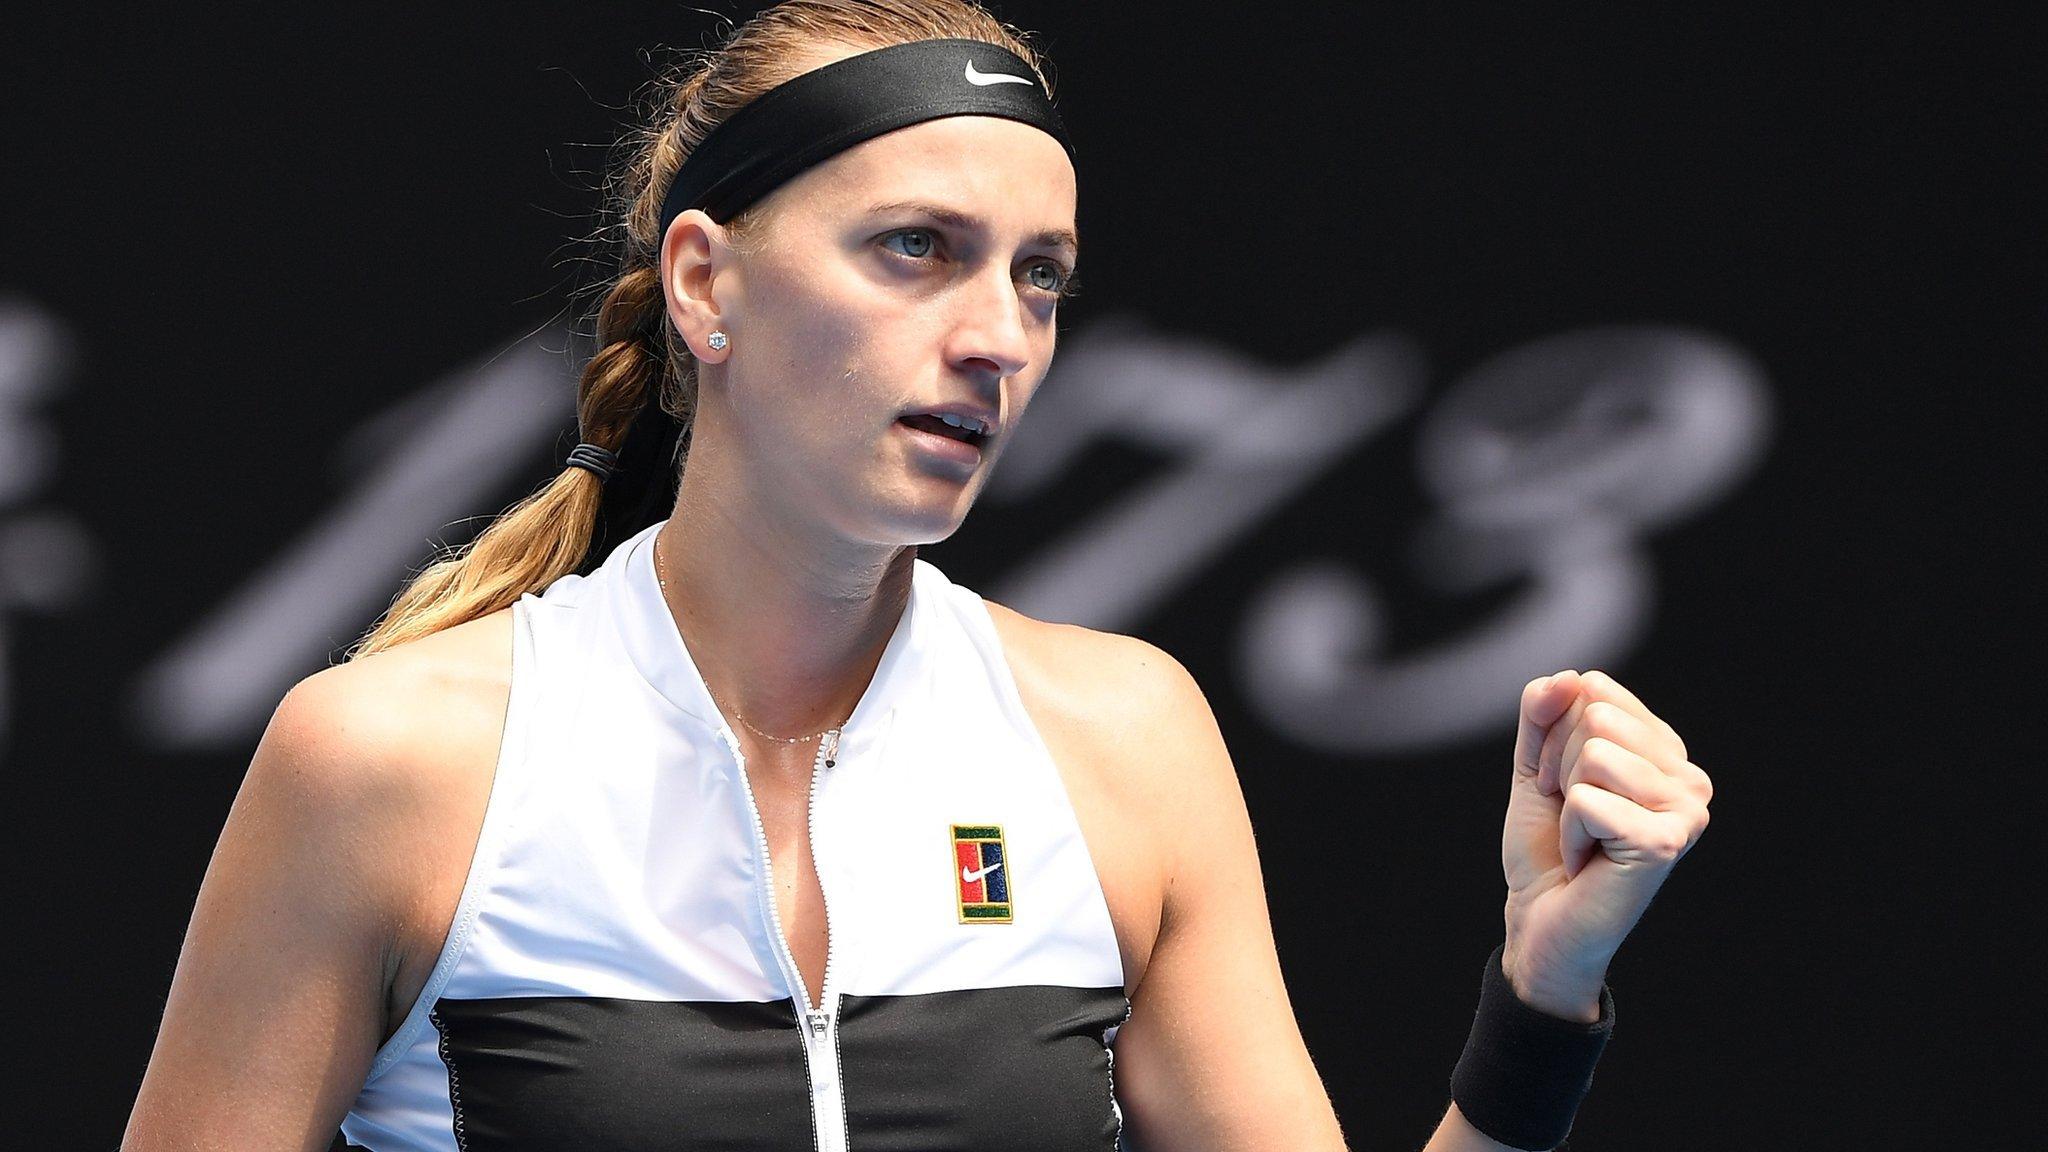 Dubai Tennis Championships: Petra Kvitova through to last 16